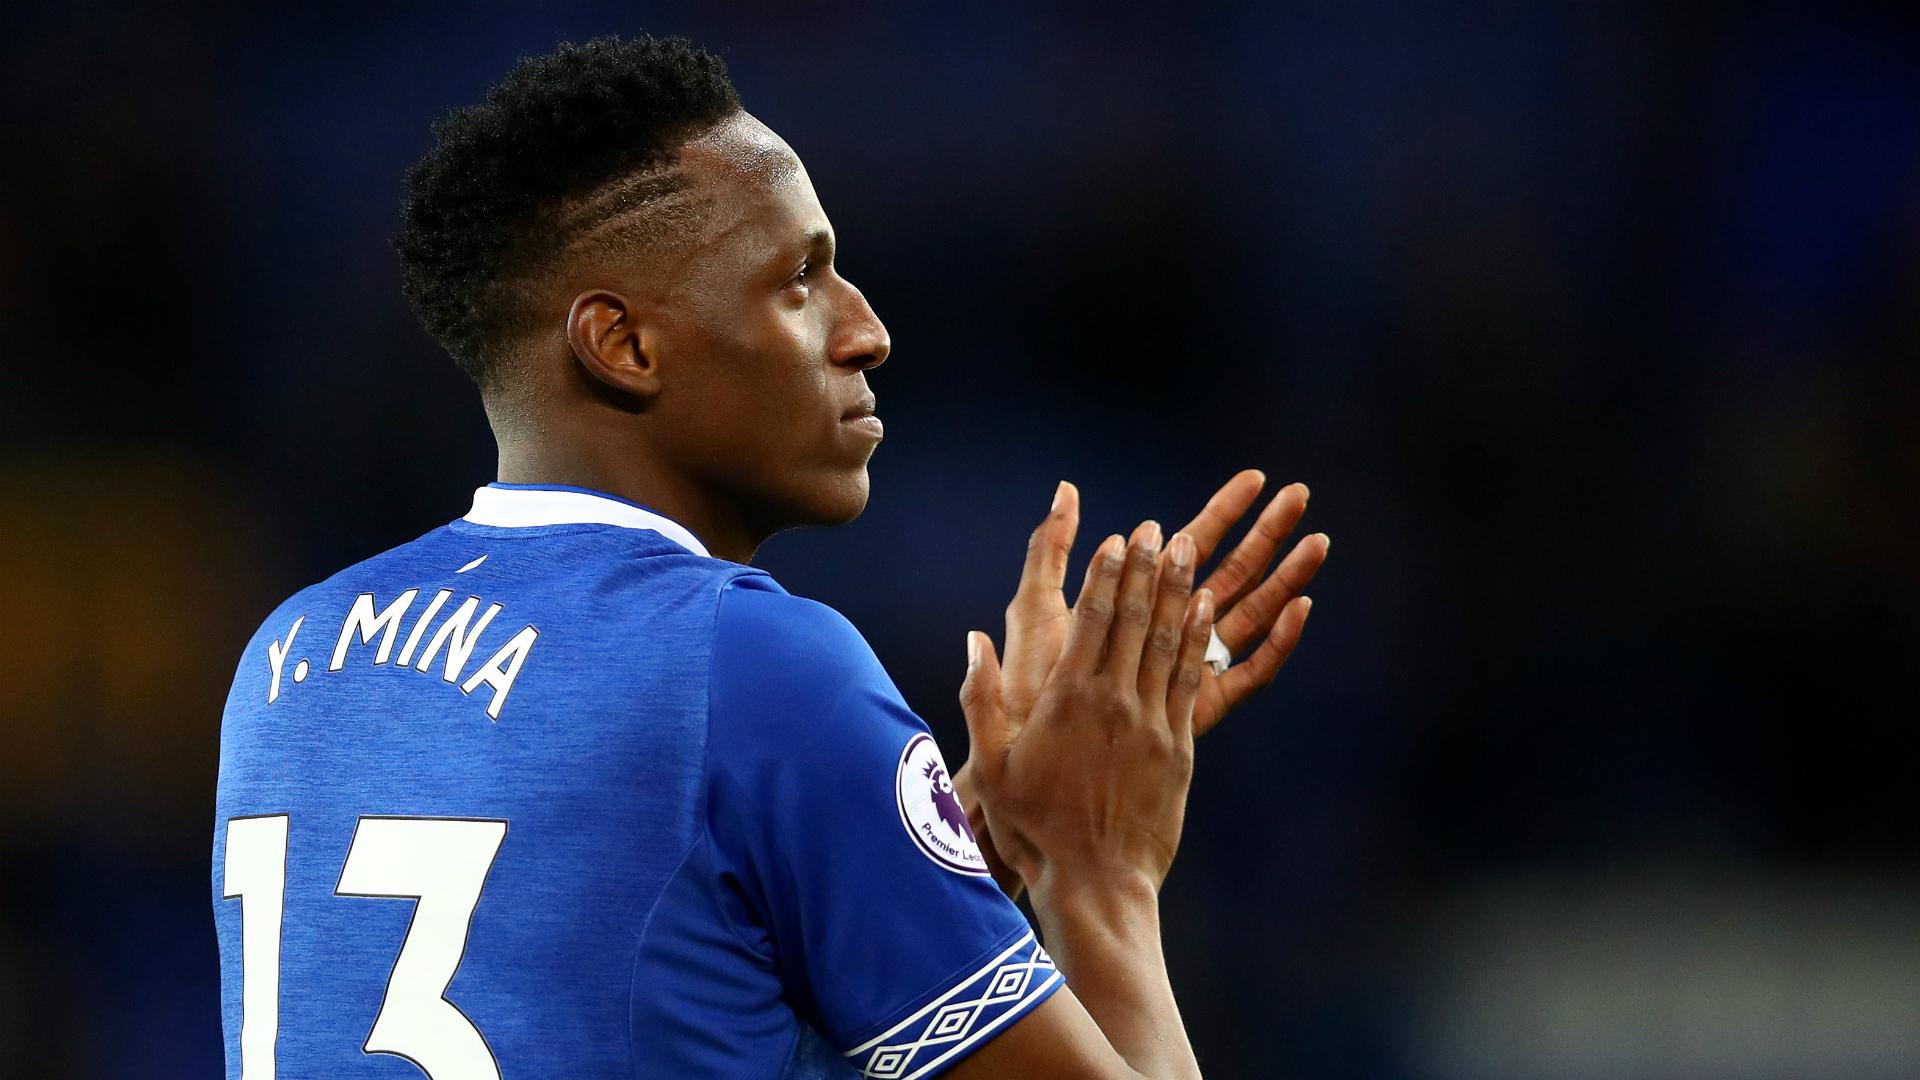 Everton fans love Yerry Mina, says Marco Silva